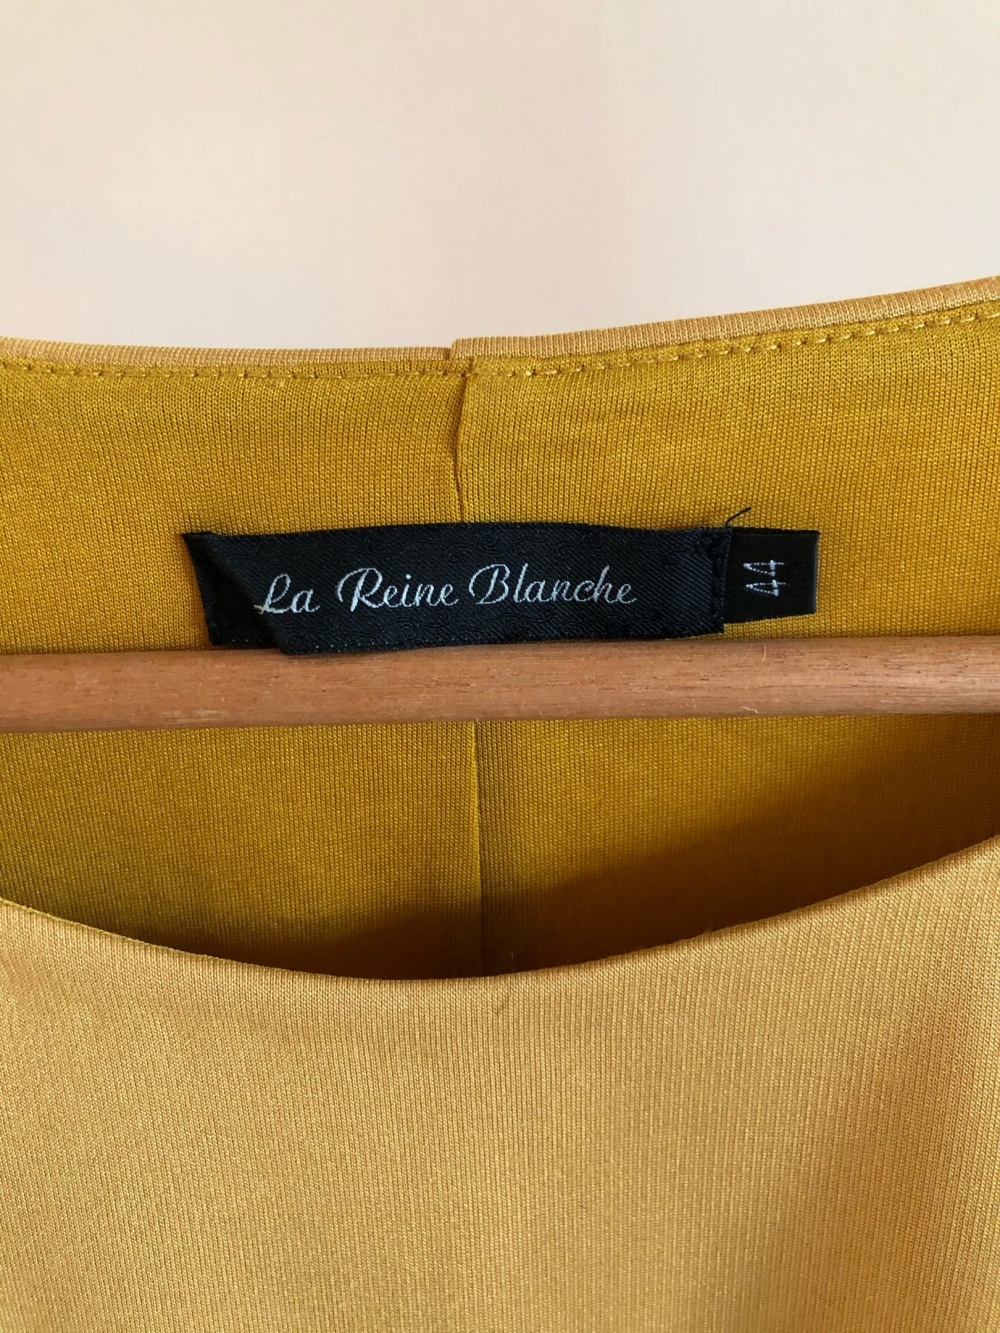 Платье La Reine Blanche, размер 44